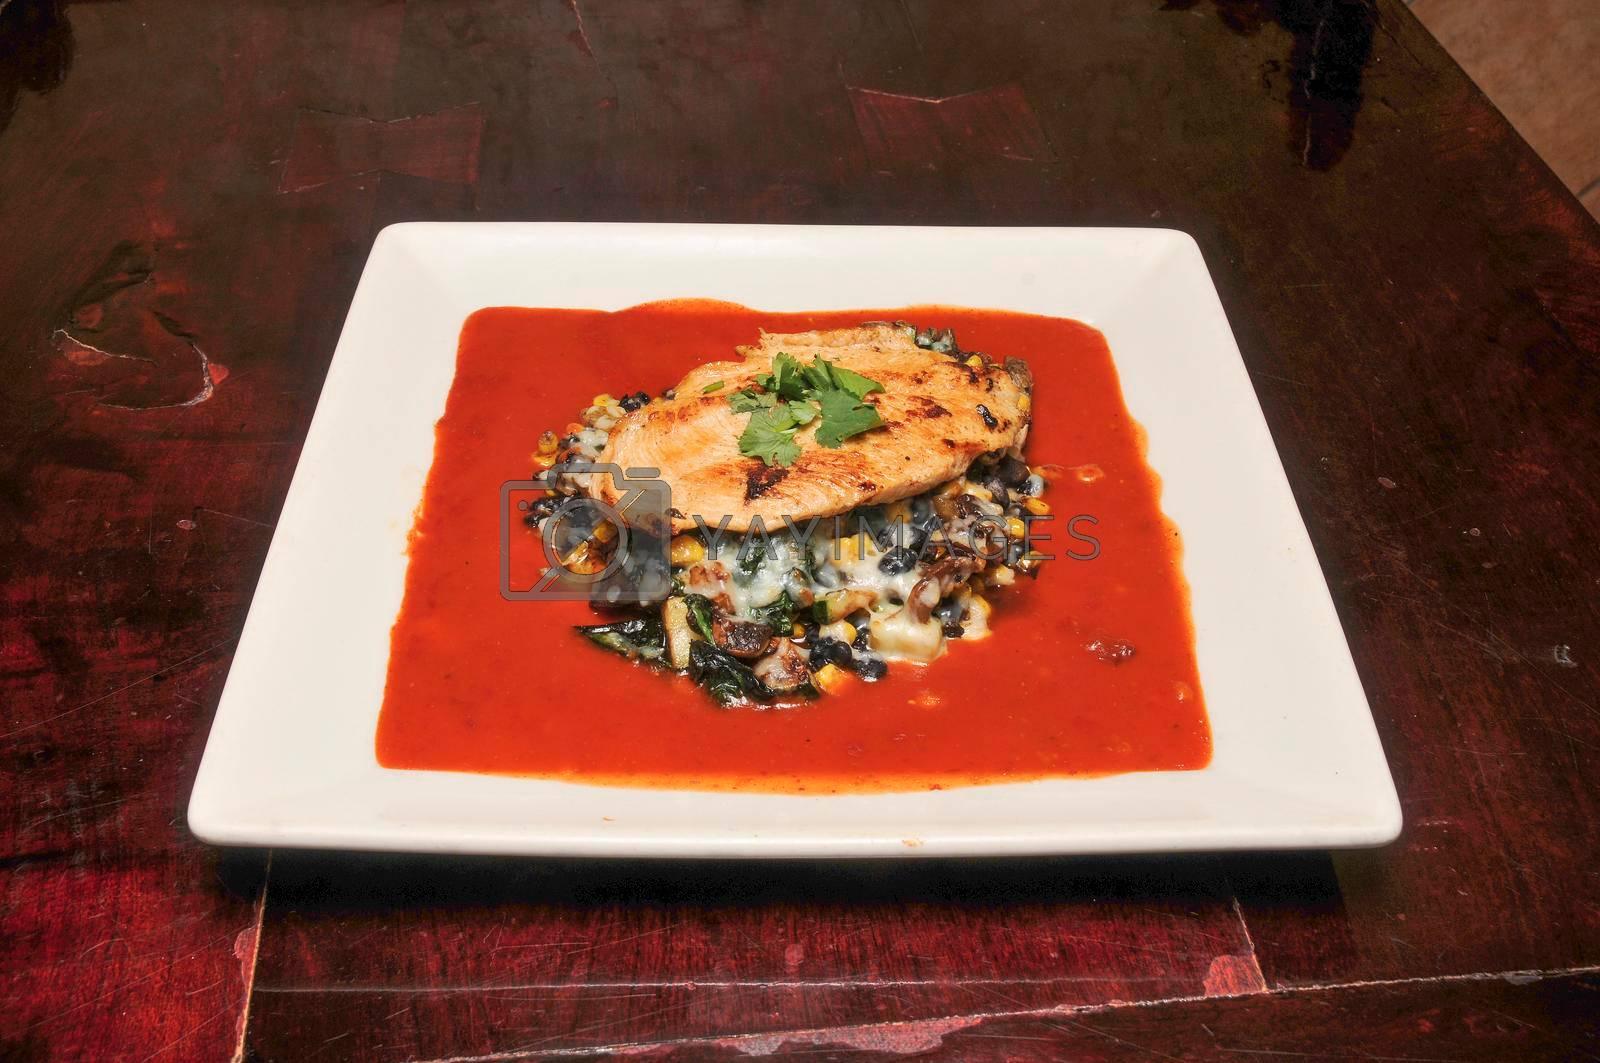 Delicious Mexican cuisine known best as pollo relleno